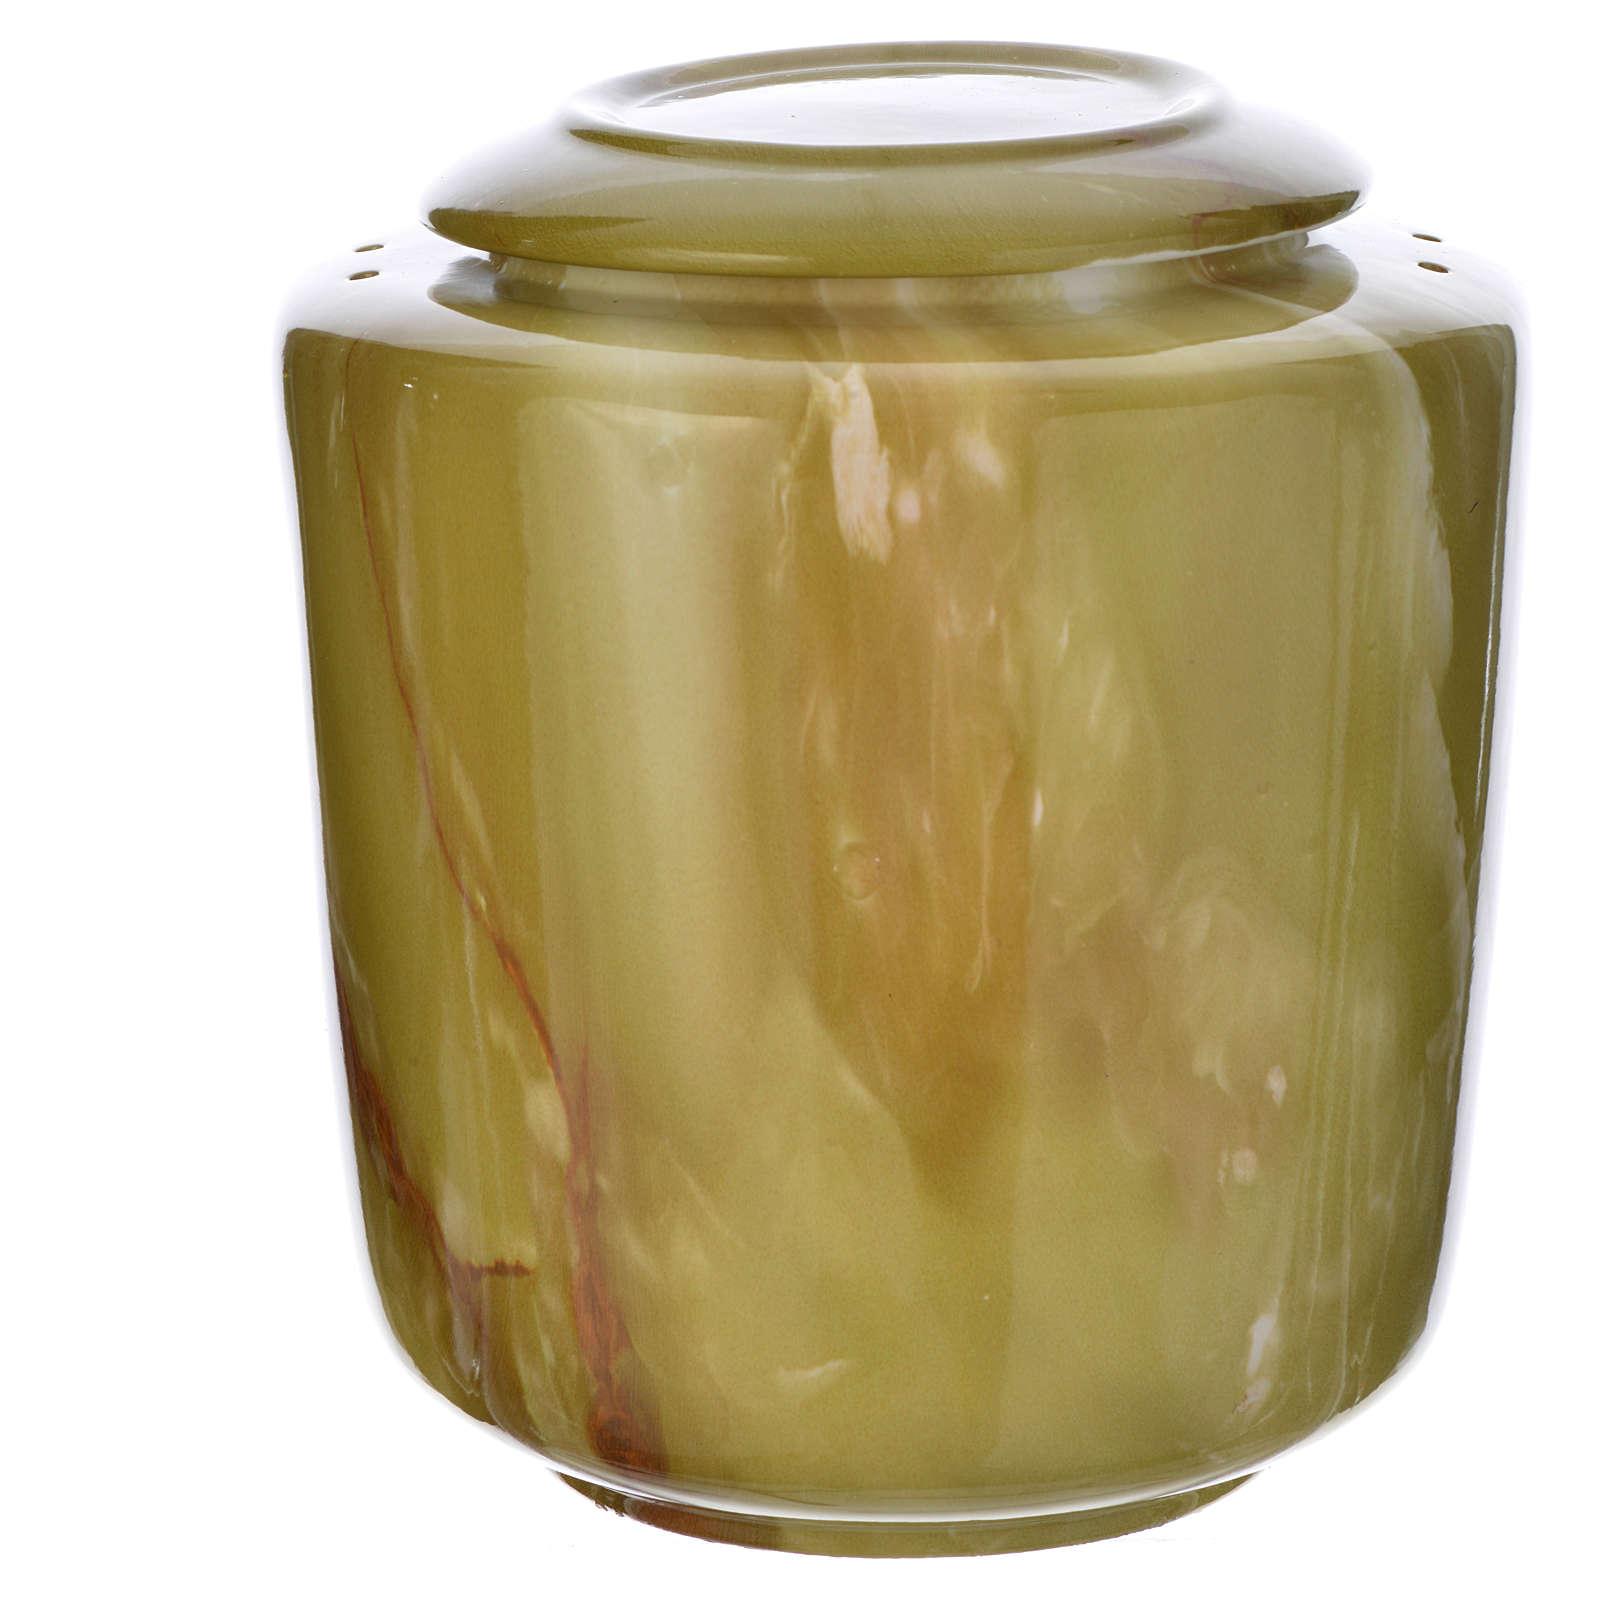 Urna fúnebre porcelana mod. Ónix verde 3